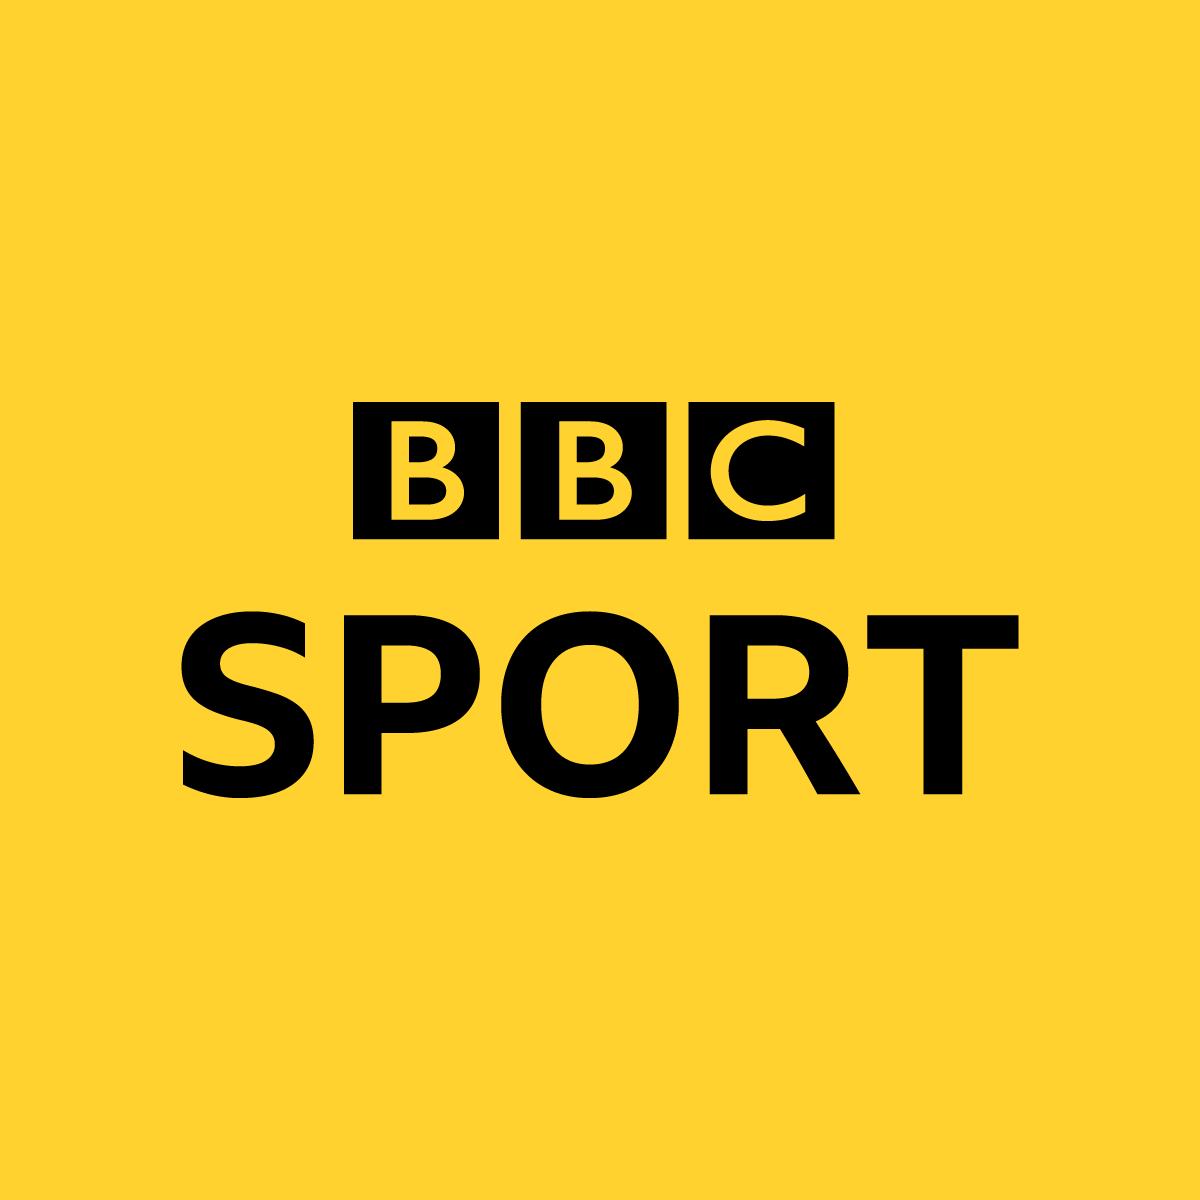 Photo: BBC Sport